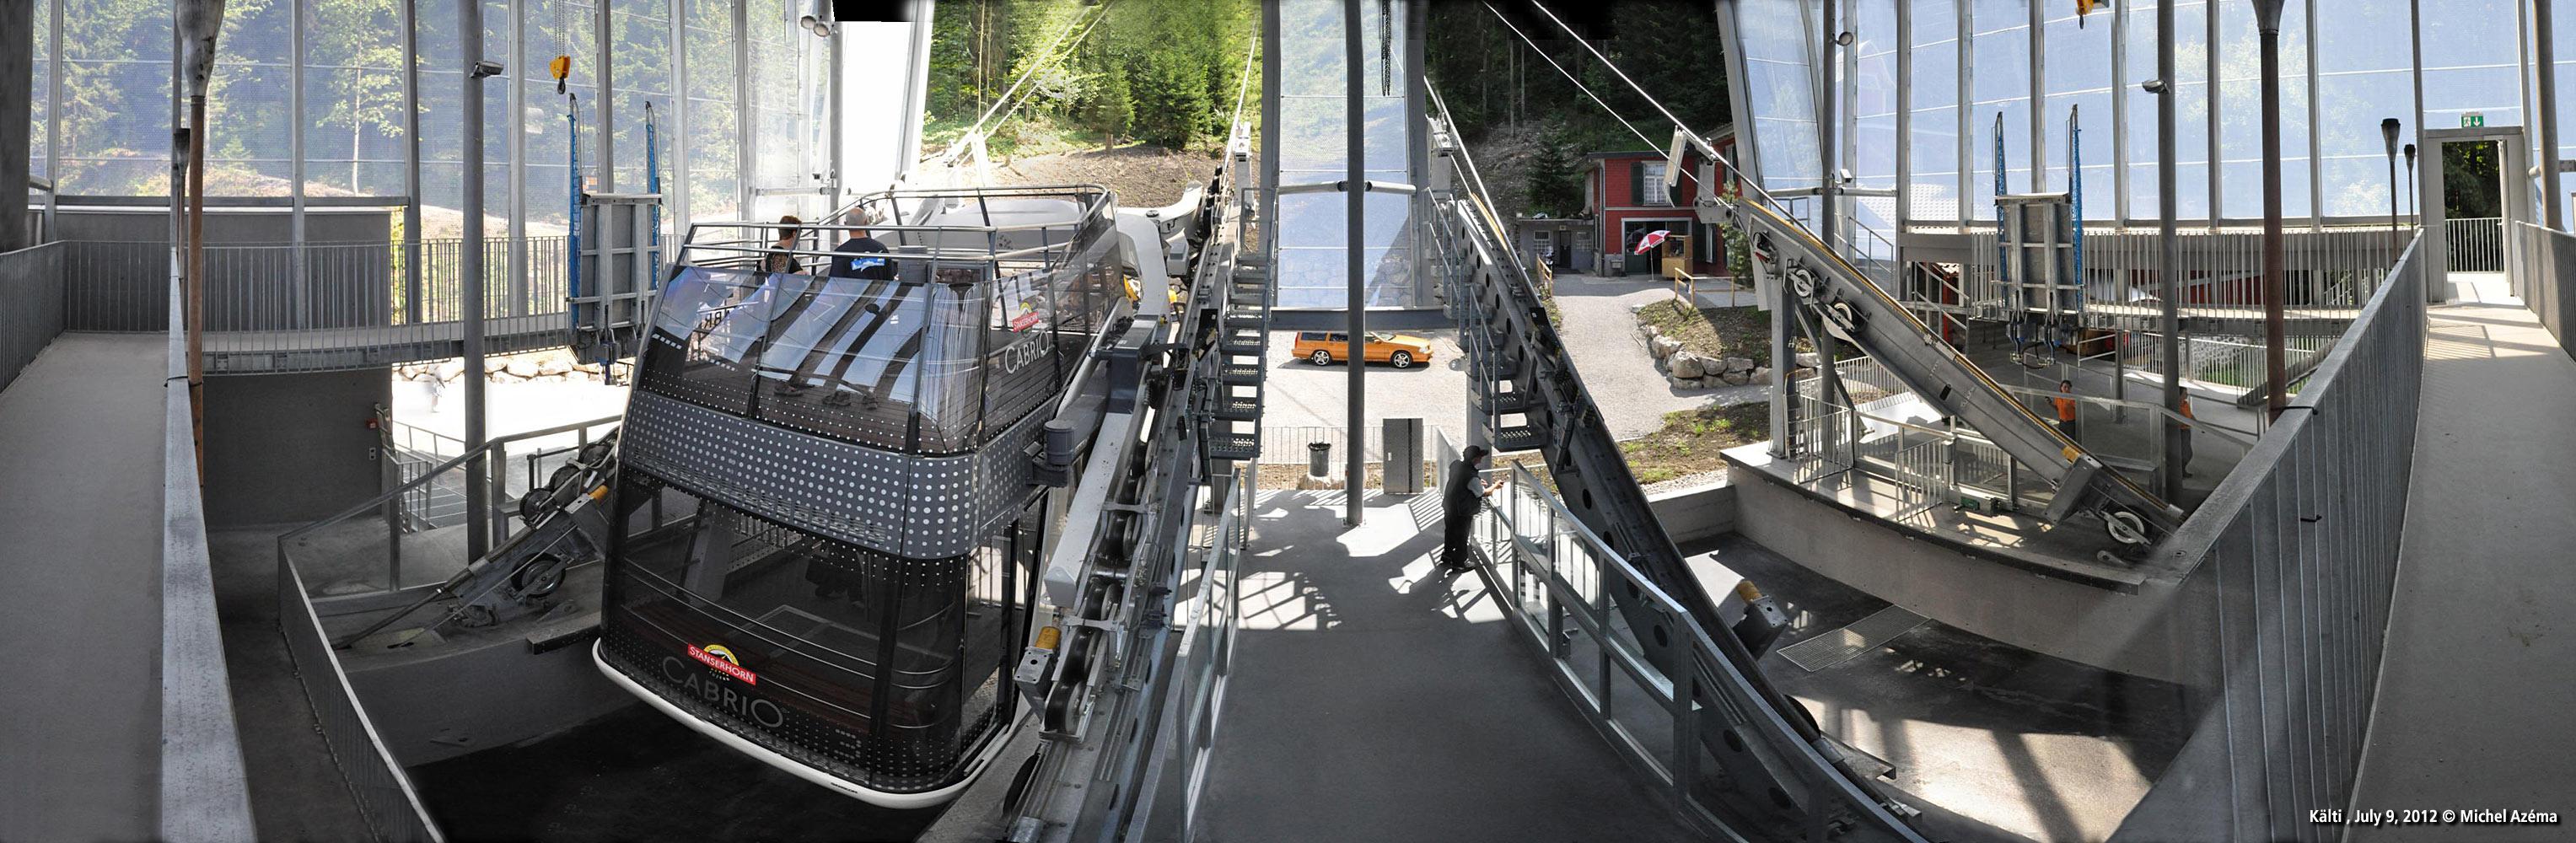 Stanserhorn CabriO at Kälti